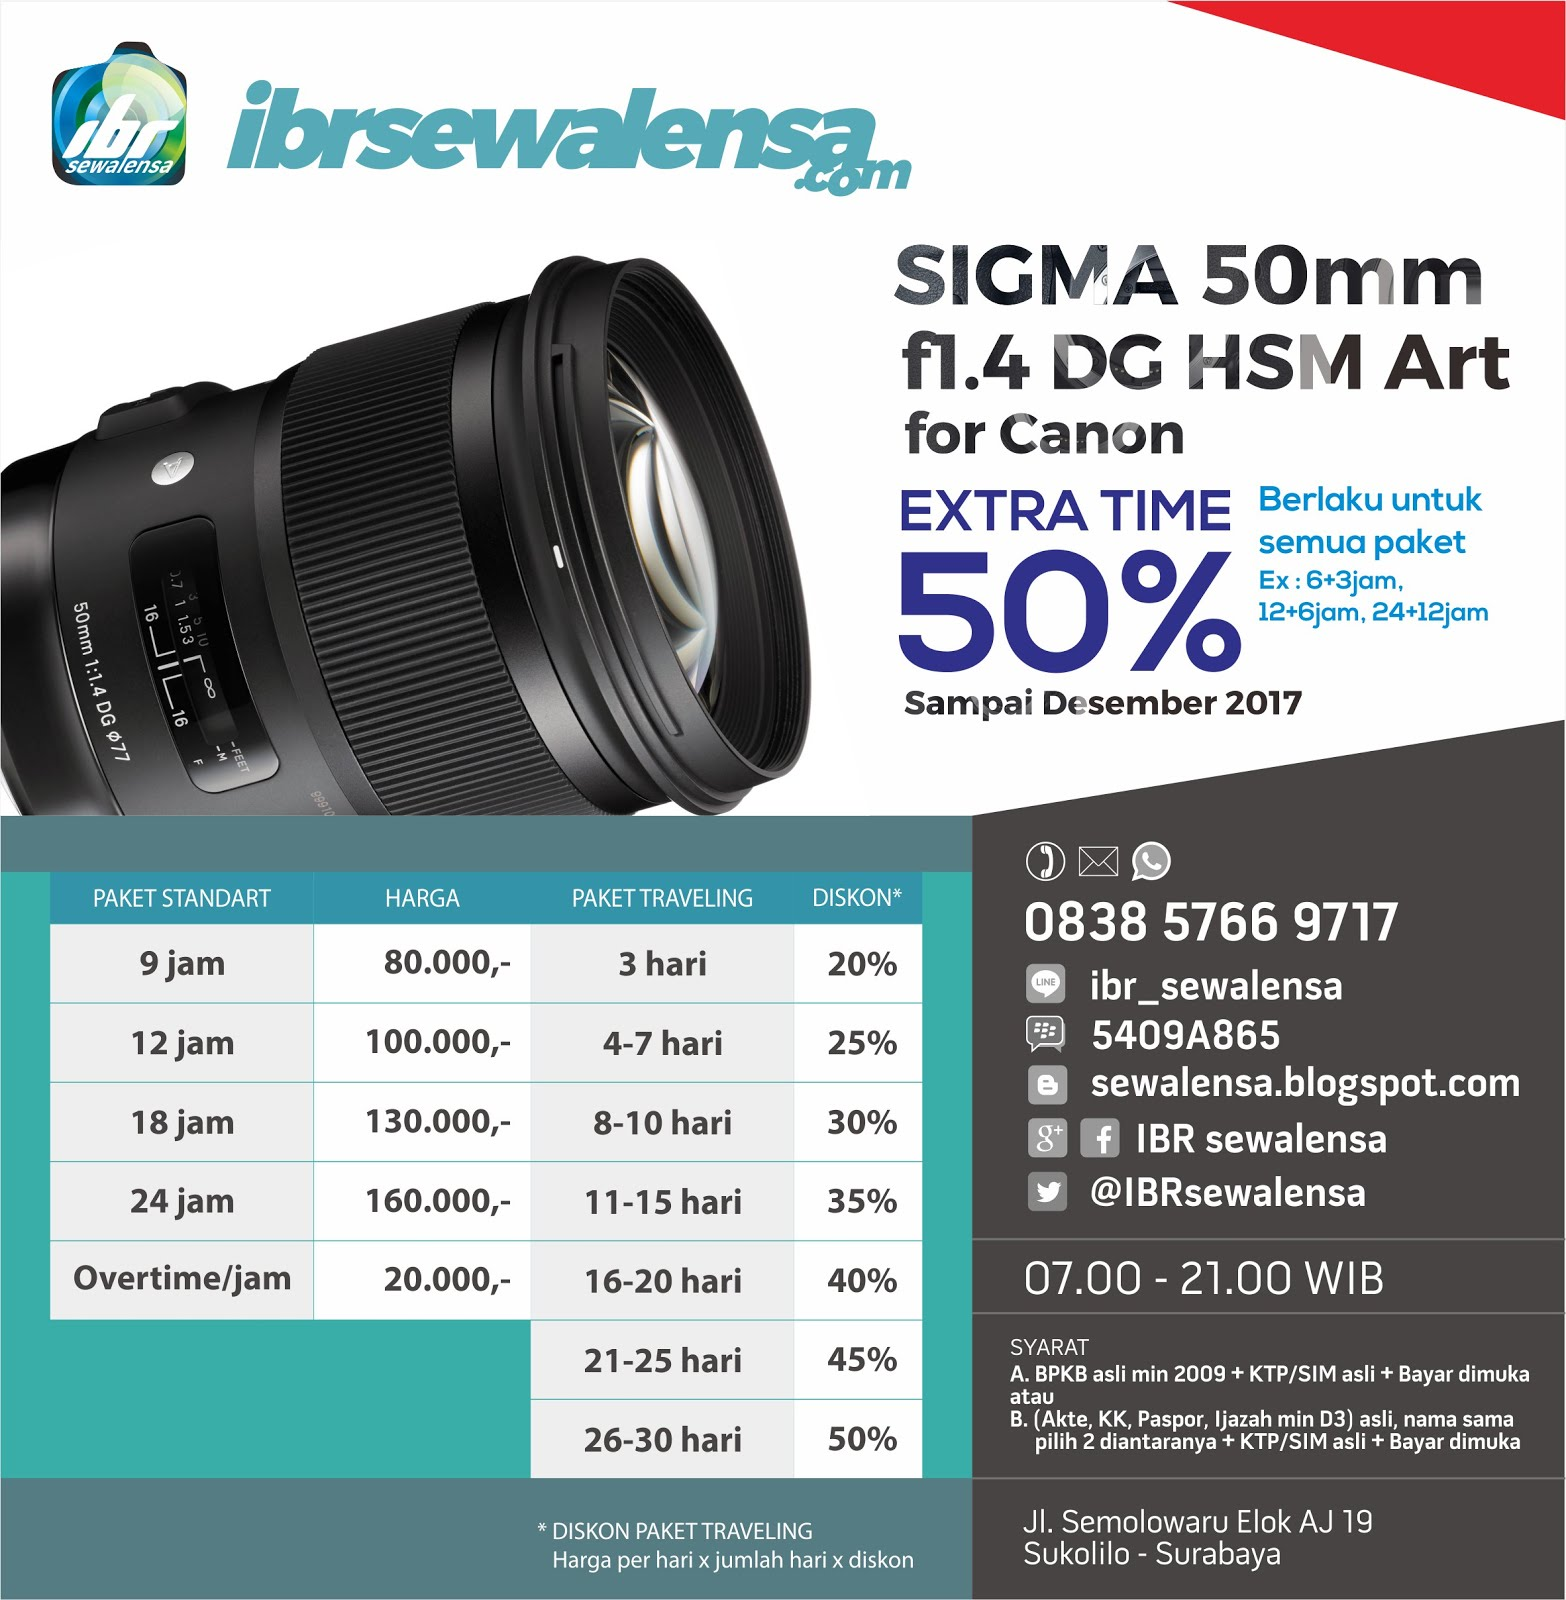 SIGMA 50mm f1.4 DG HSM Art EXTRA TIME 50%